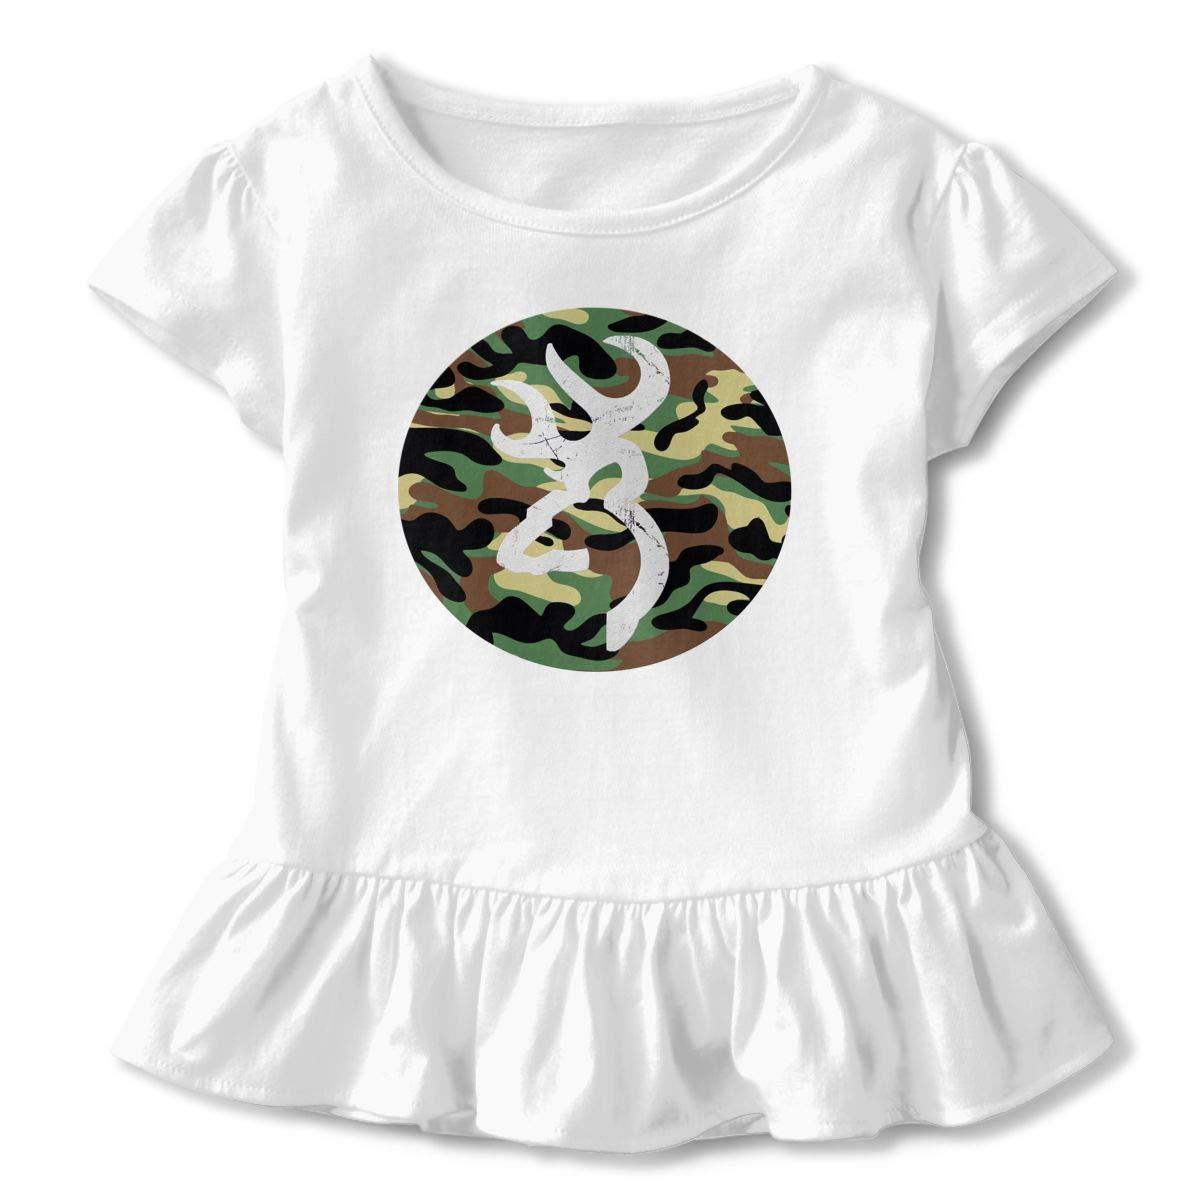 Clarissa Bertha Camouflage Deer Toddler Baby Girls Short Sleeve Ruffle T-Shirt